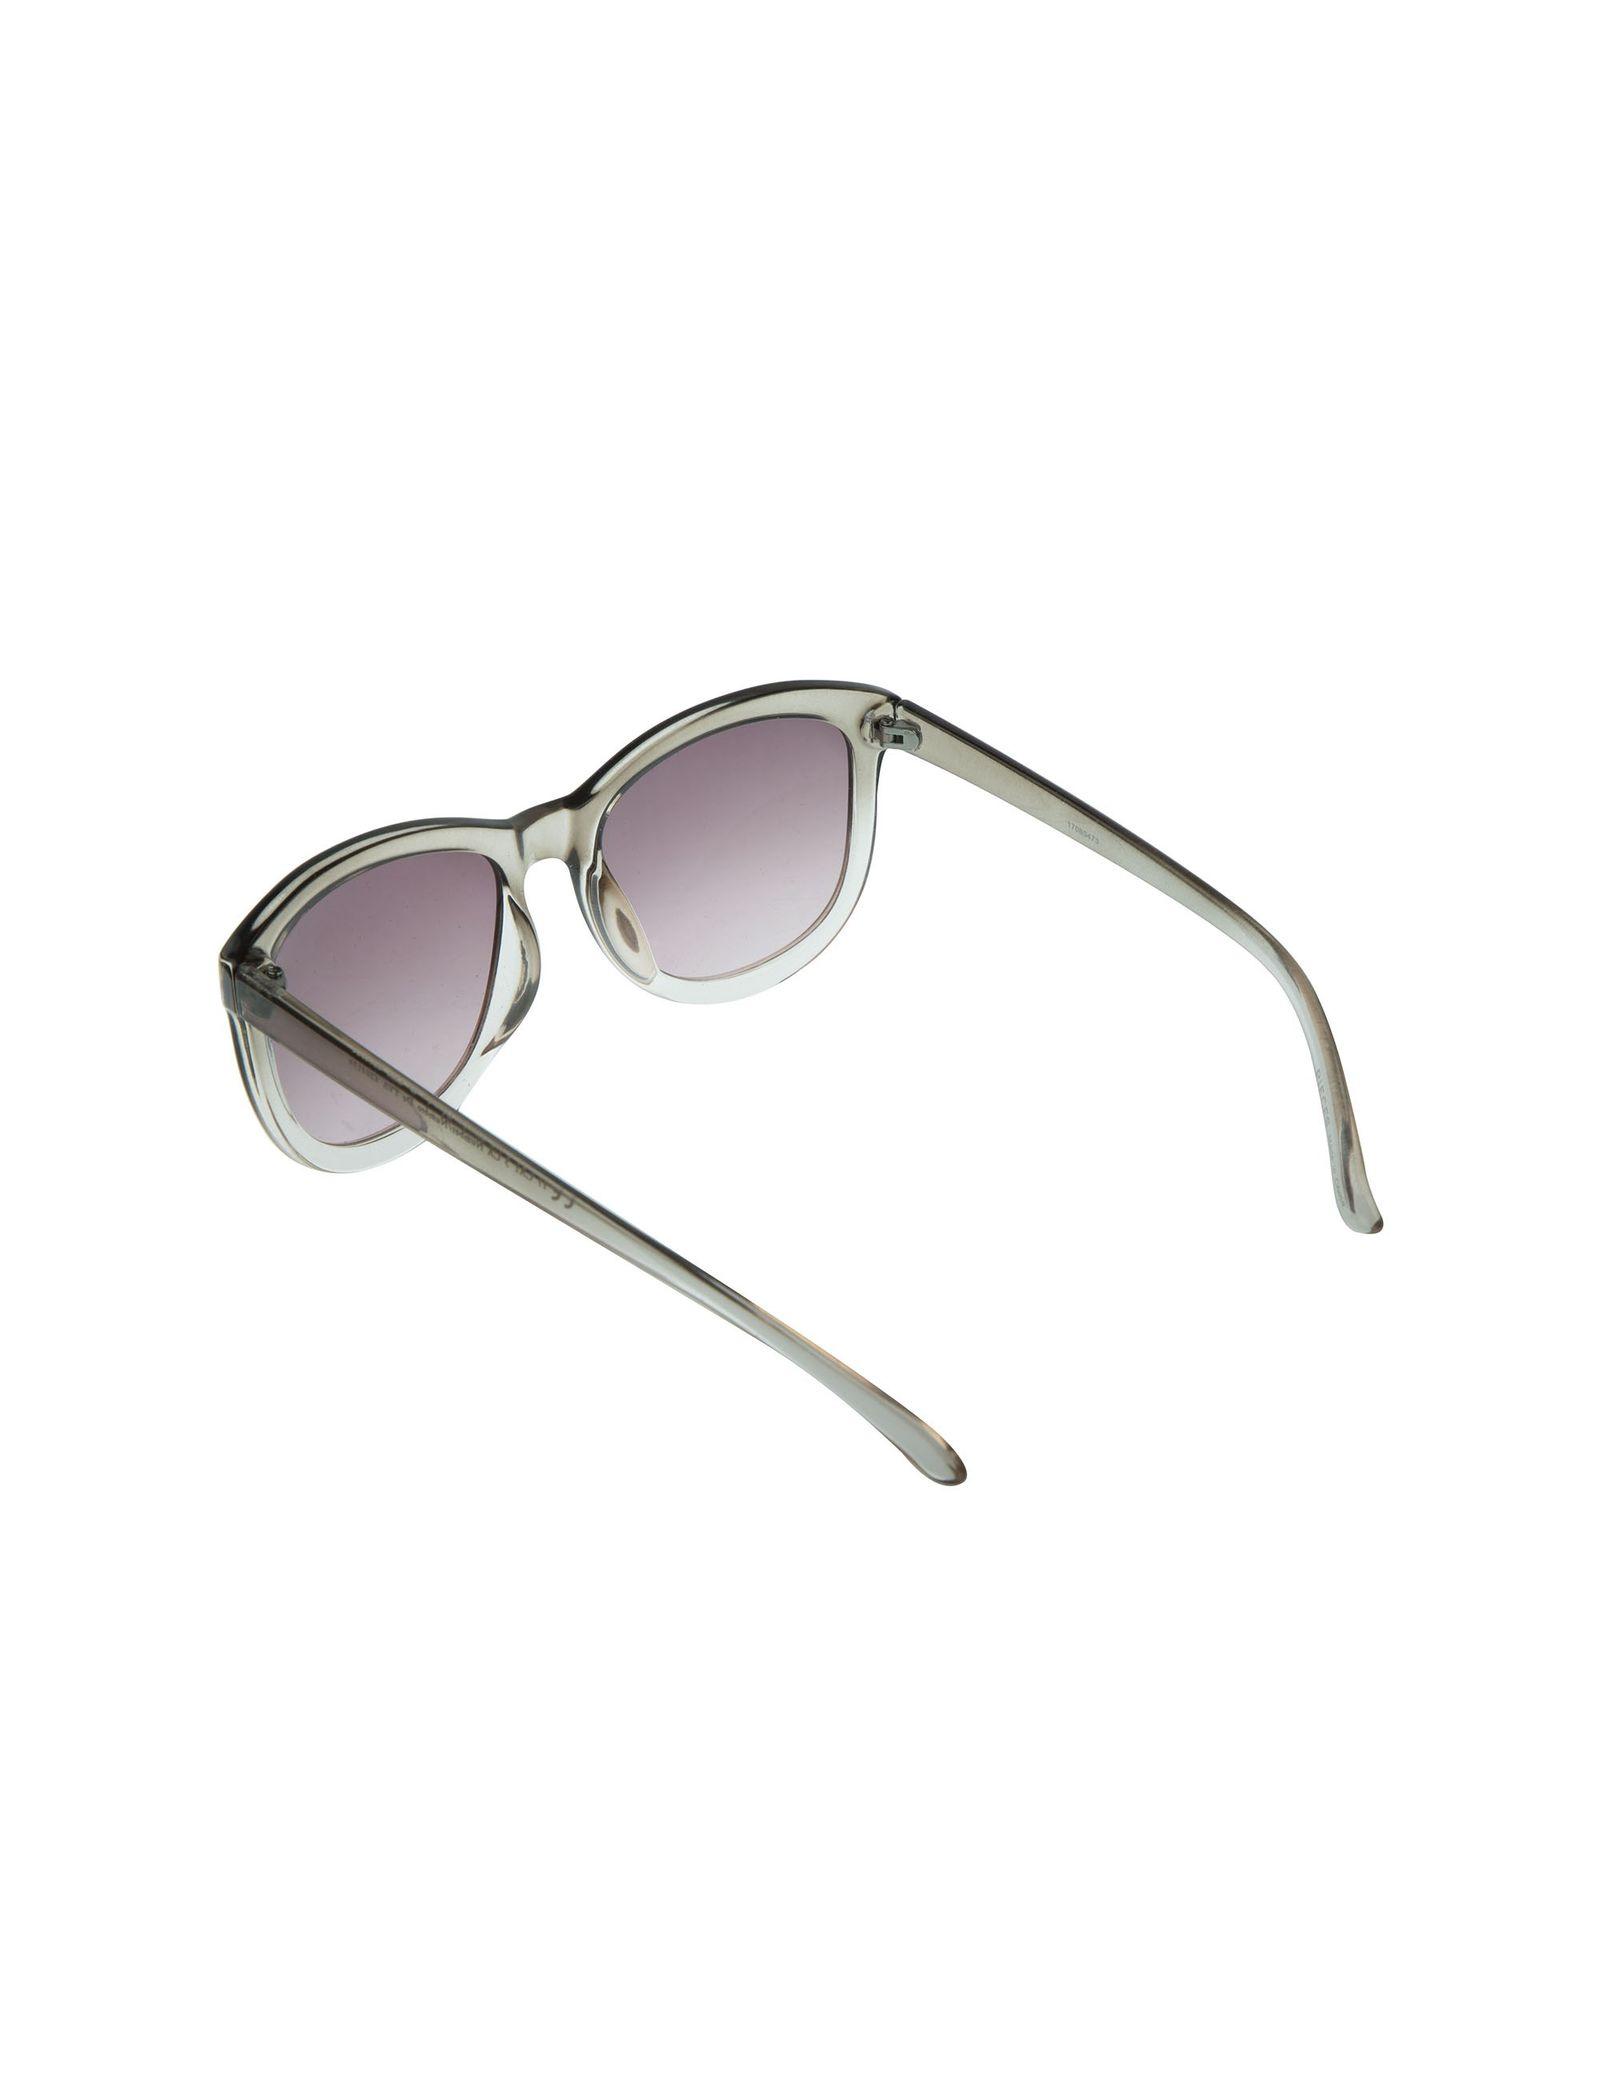 عینک آفتابی ویفرر زنانه - پی سز - قهوه اي  - 4